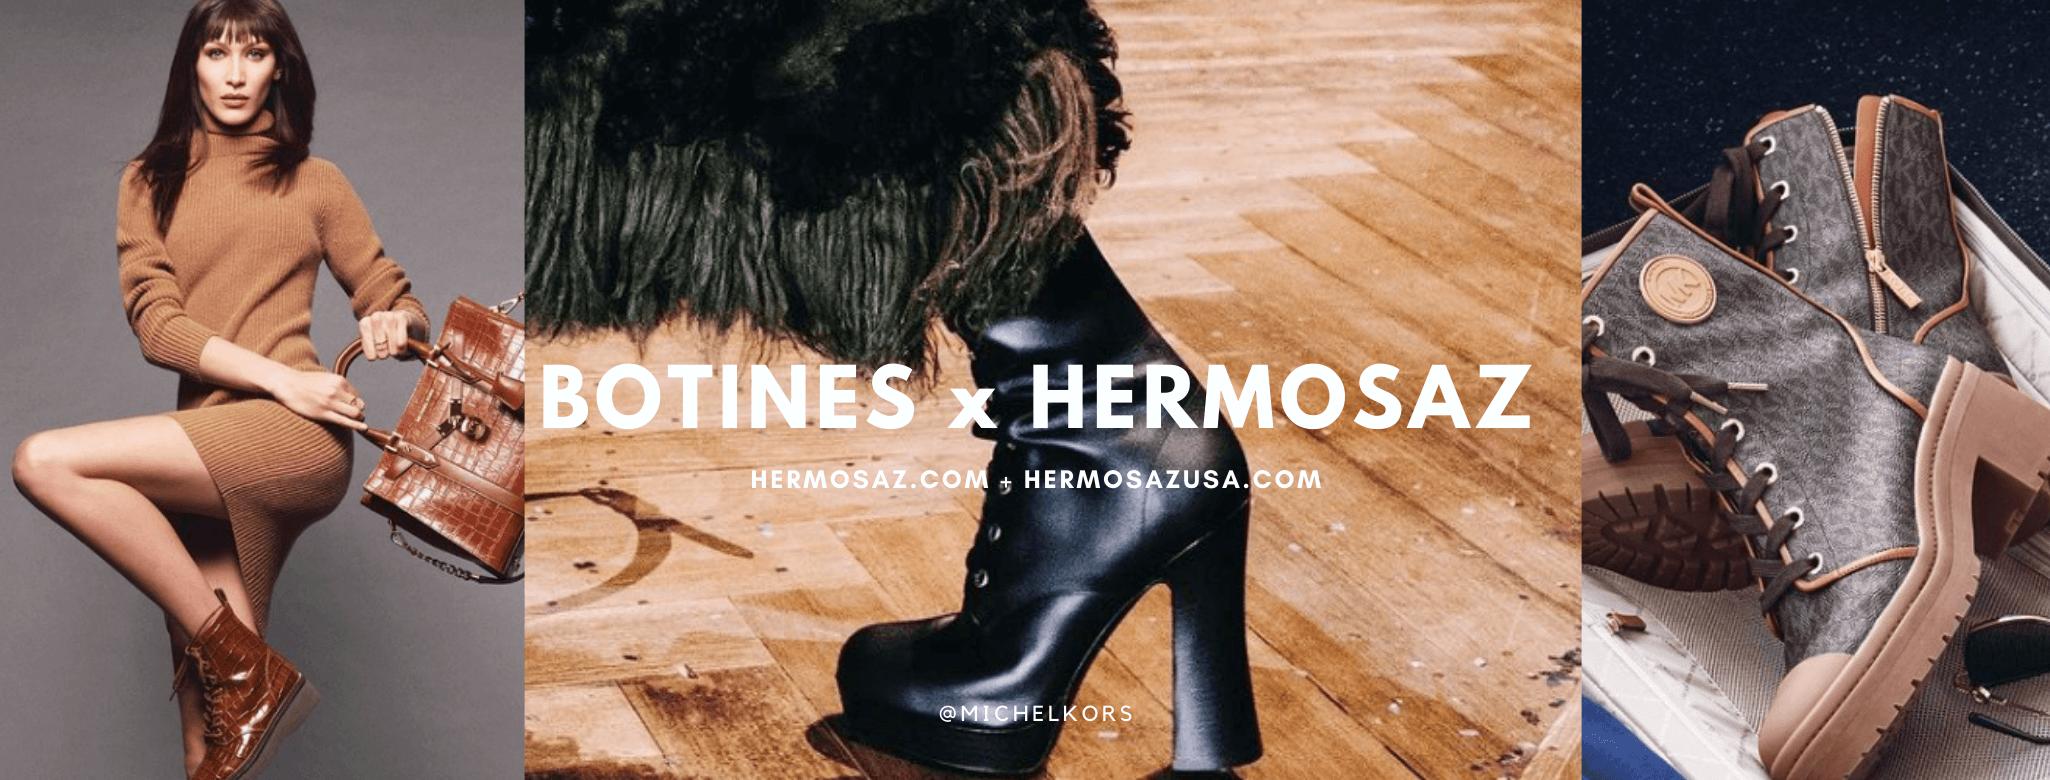 Botines x Hermosaz